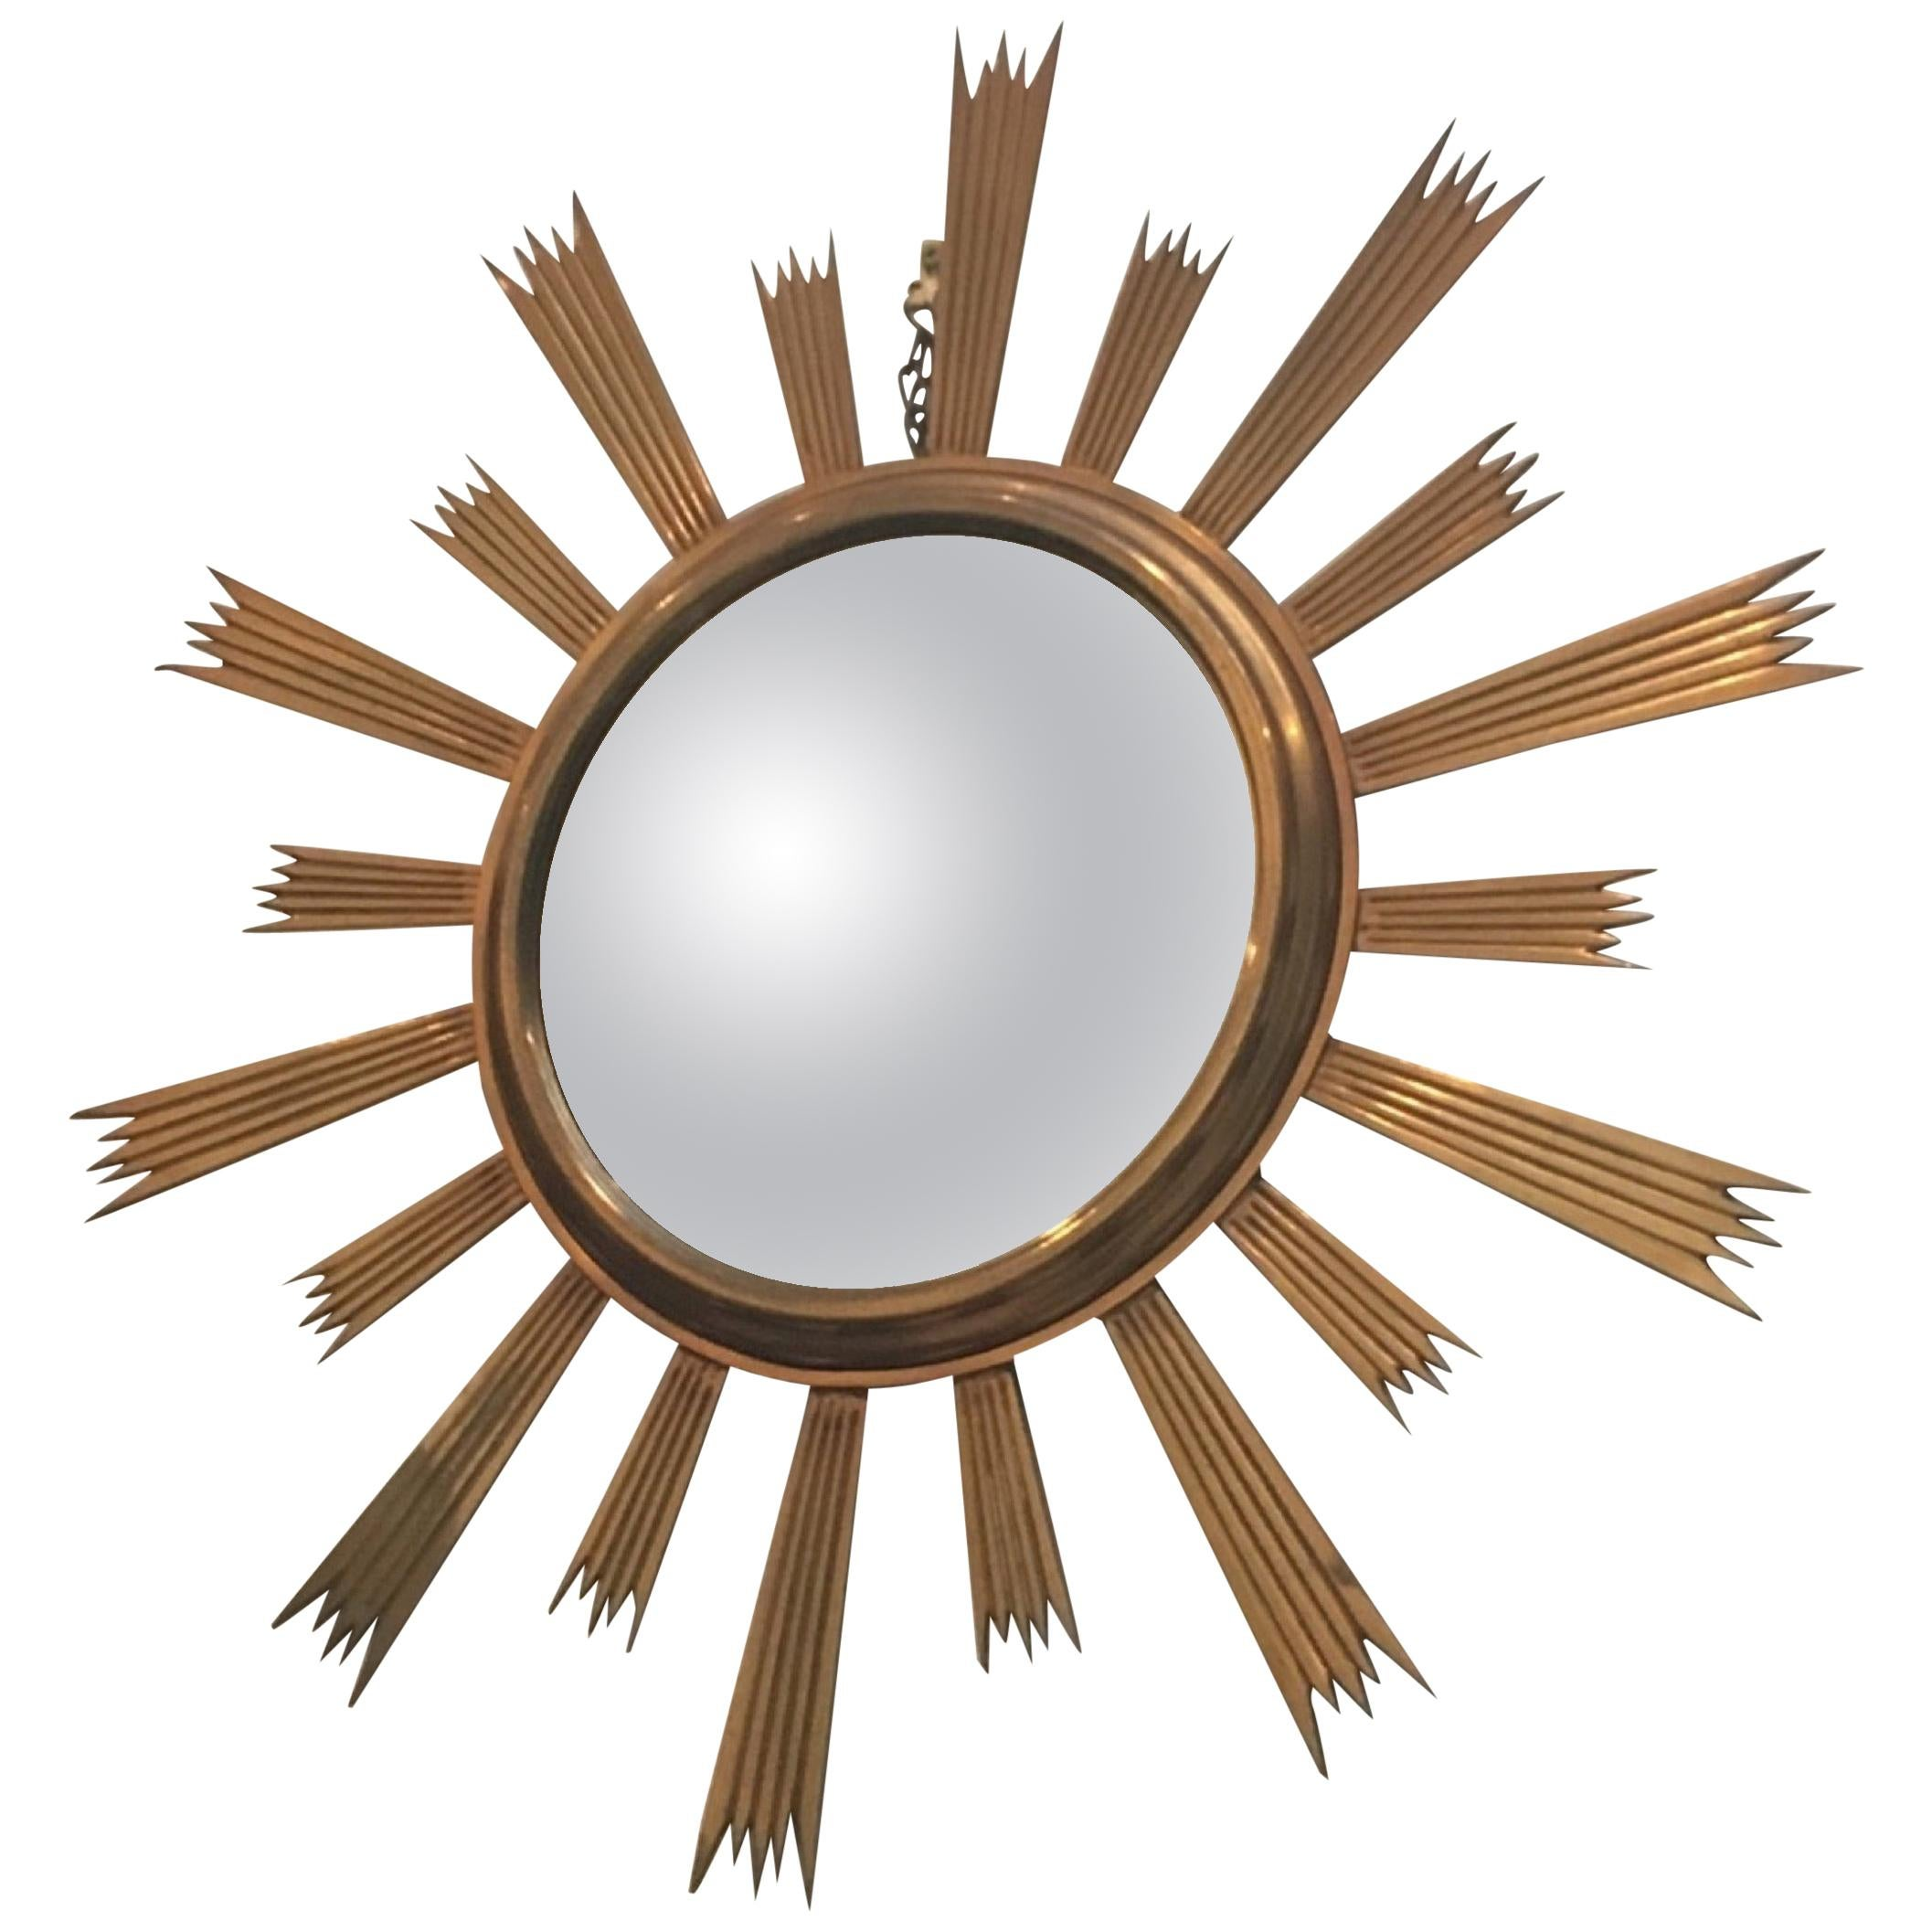 Rare Gild Brass Sunburst Mirror, circa 1960